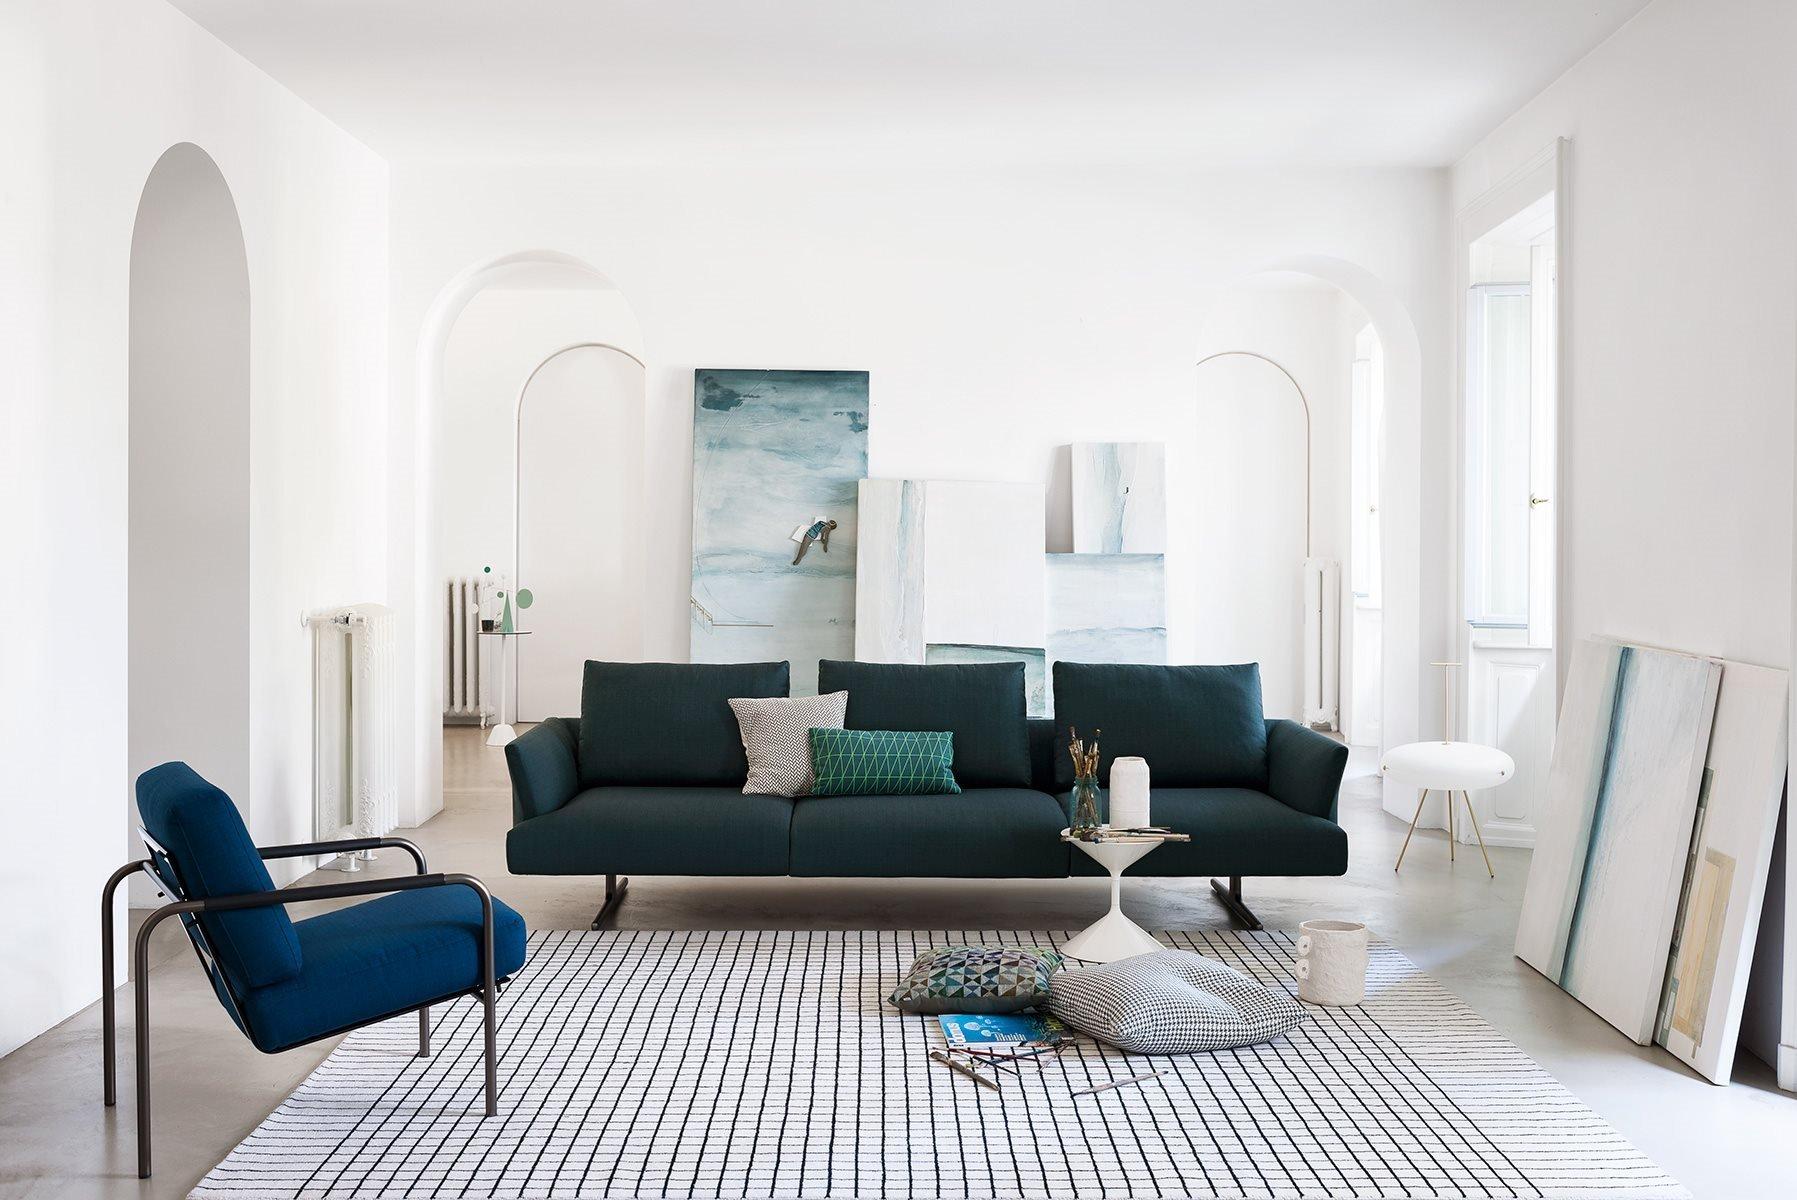 Hiro Sofa modular from Zanotta, designed by Damian Williamson